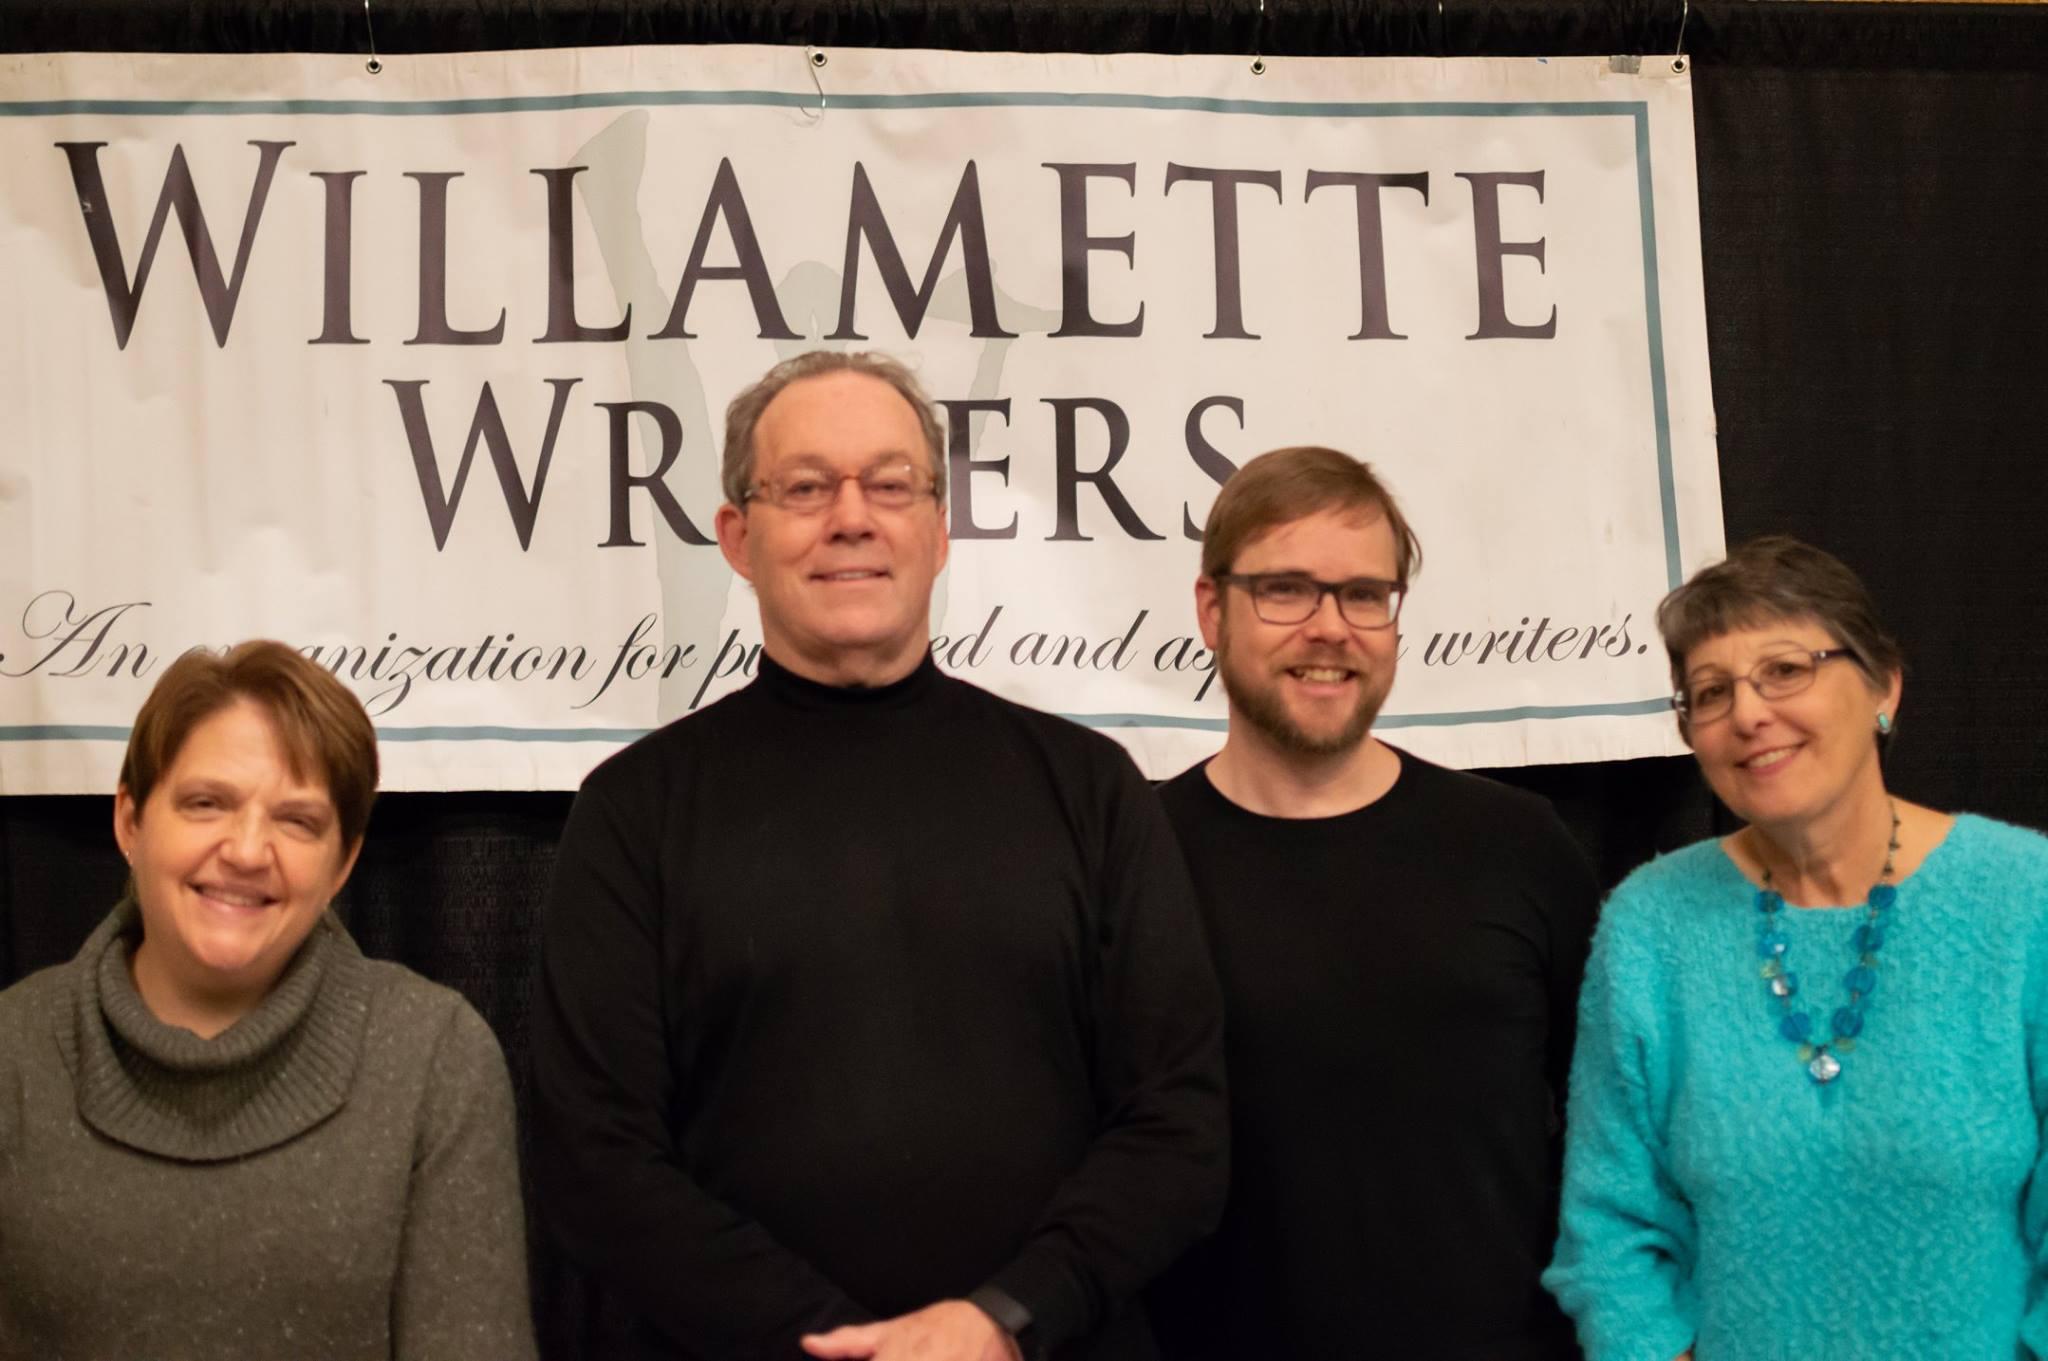 WW authors at Wordstock